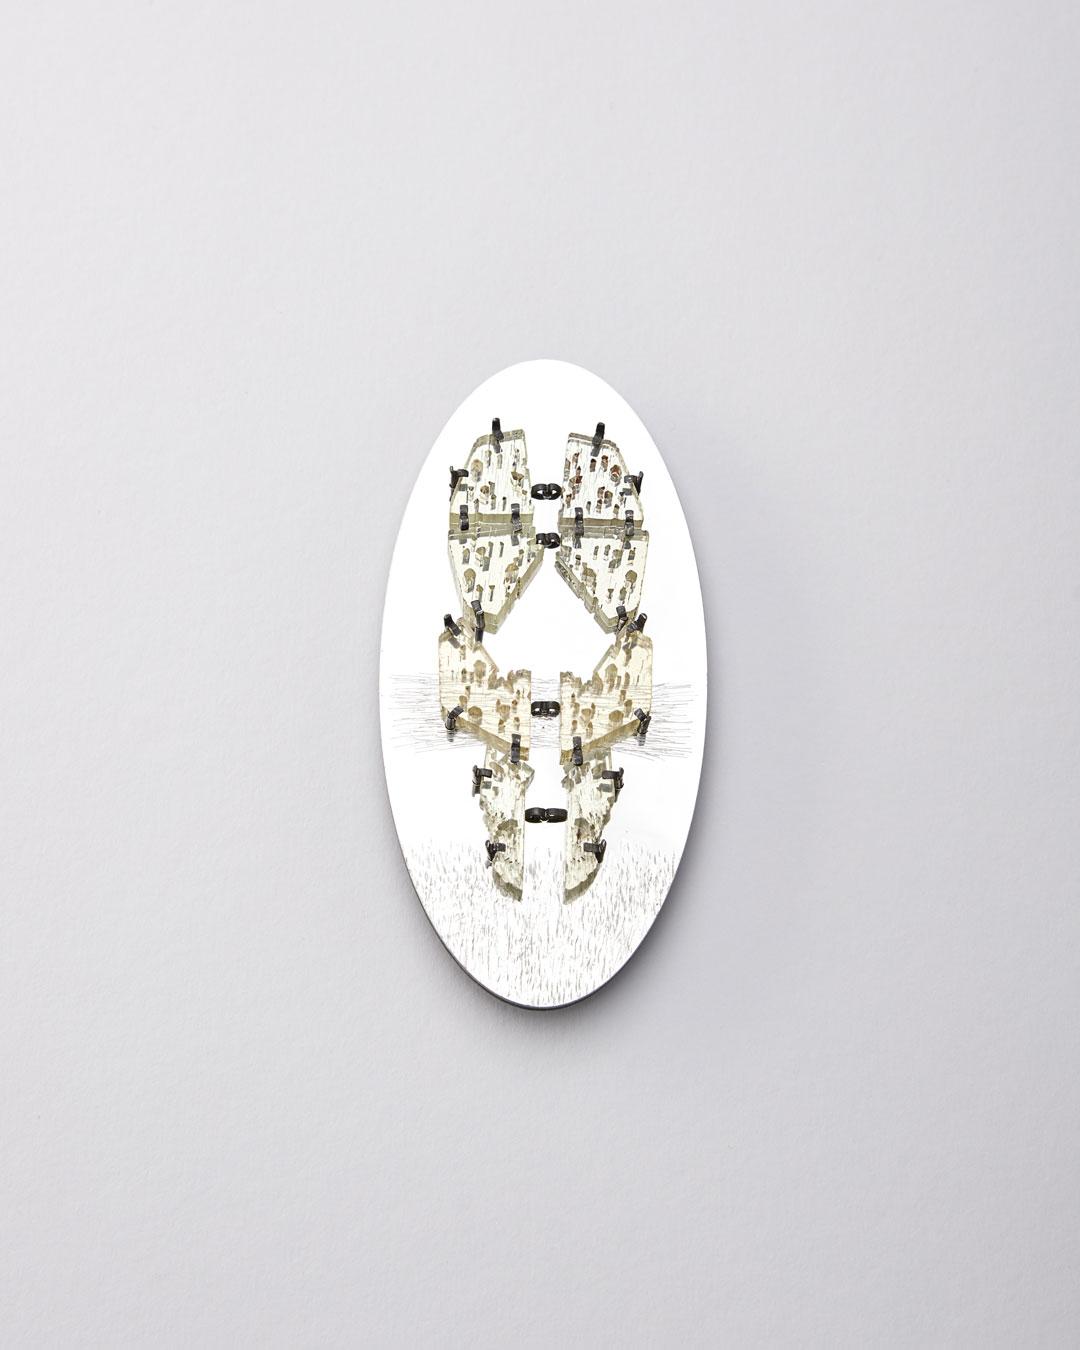 Iris Bodemer, Figur 2 (Figure 2), 2019, brooch; beryl, Alu-Dibond, silver, mounting adhesive, 130 x 65 x 15 mm, €4000